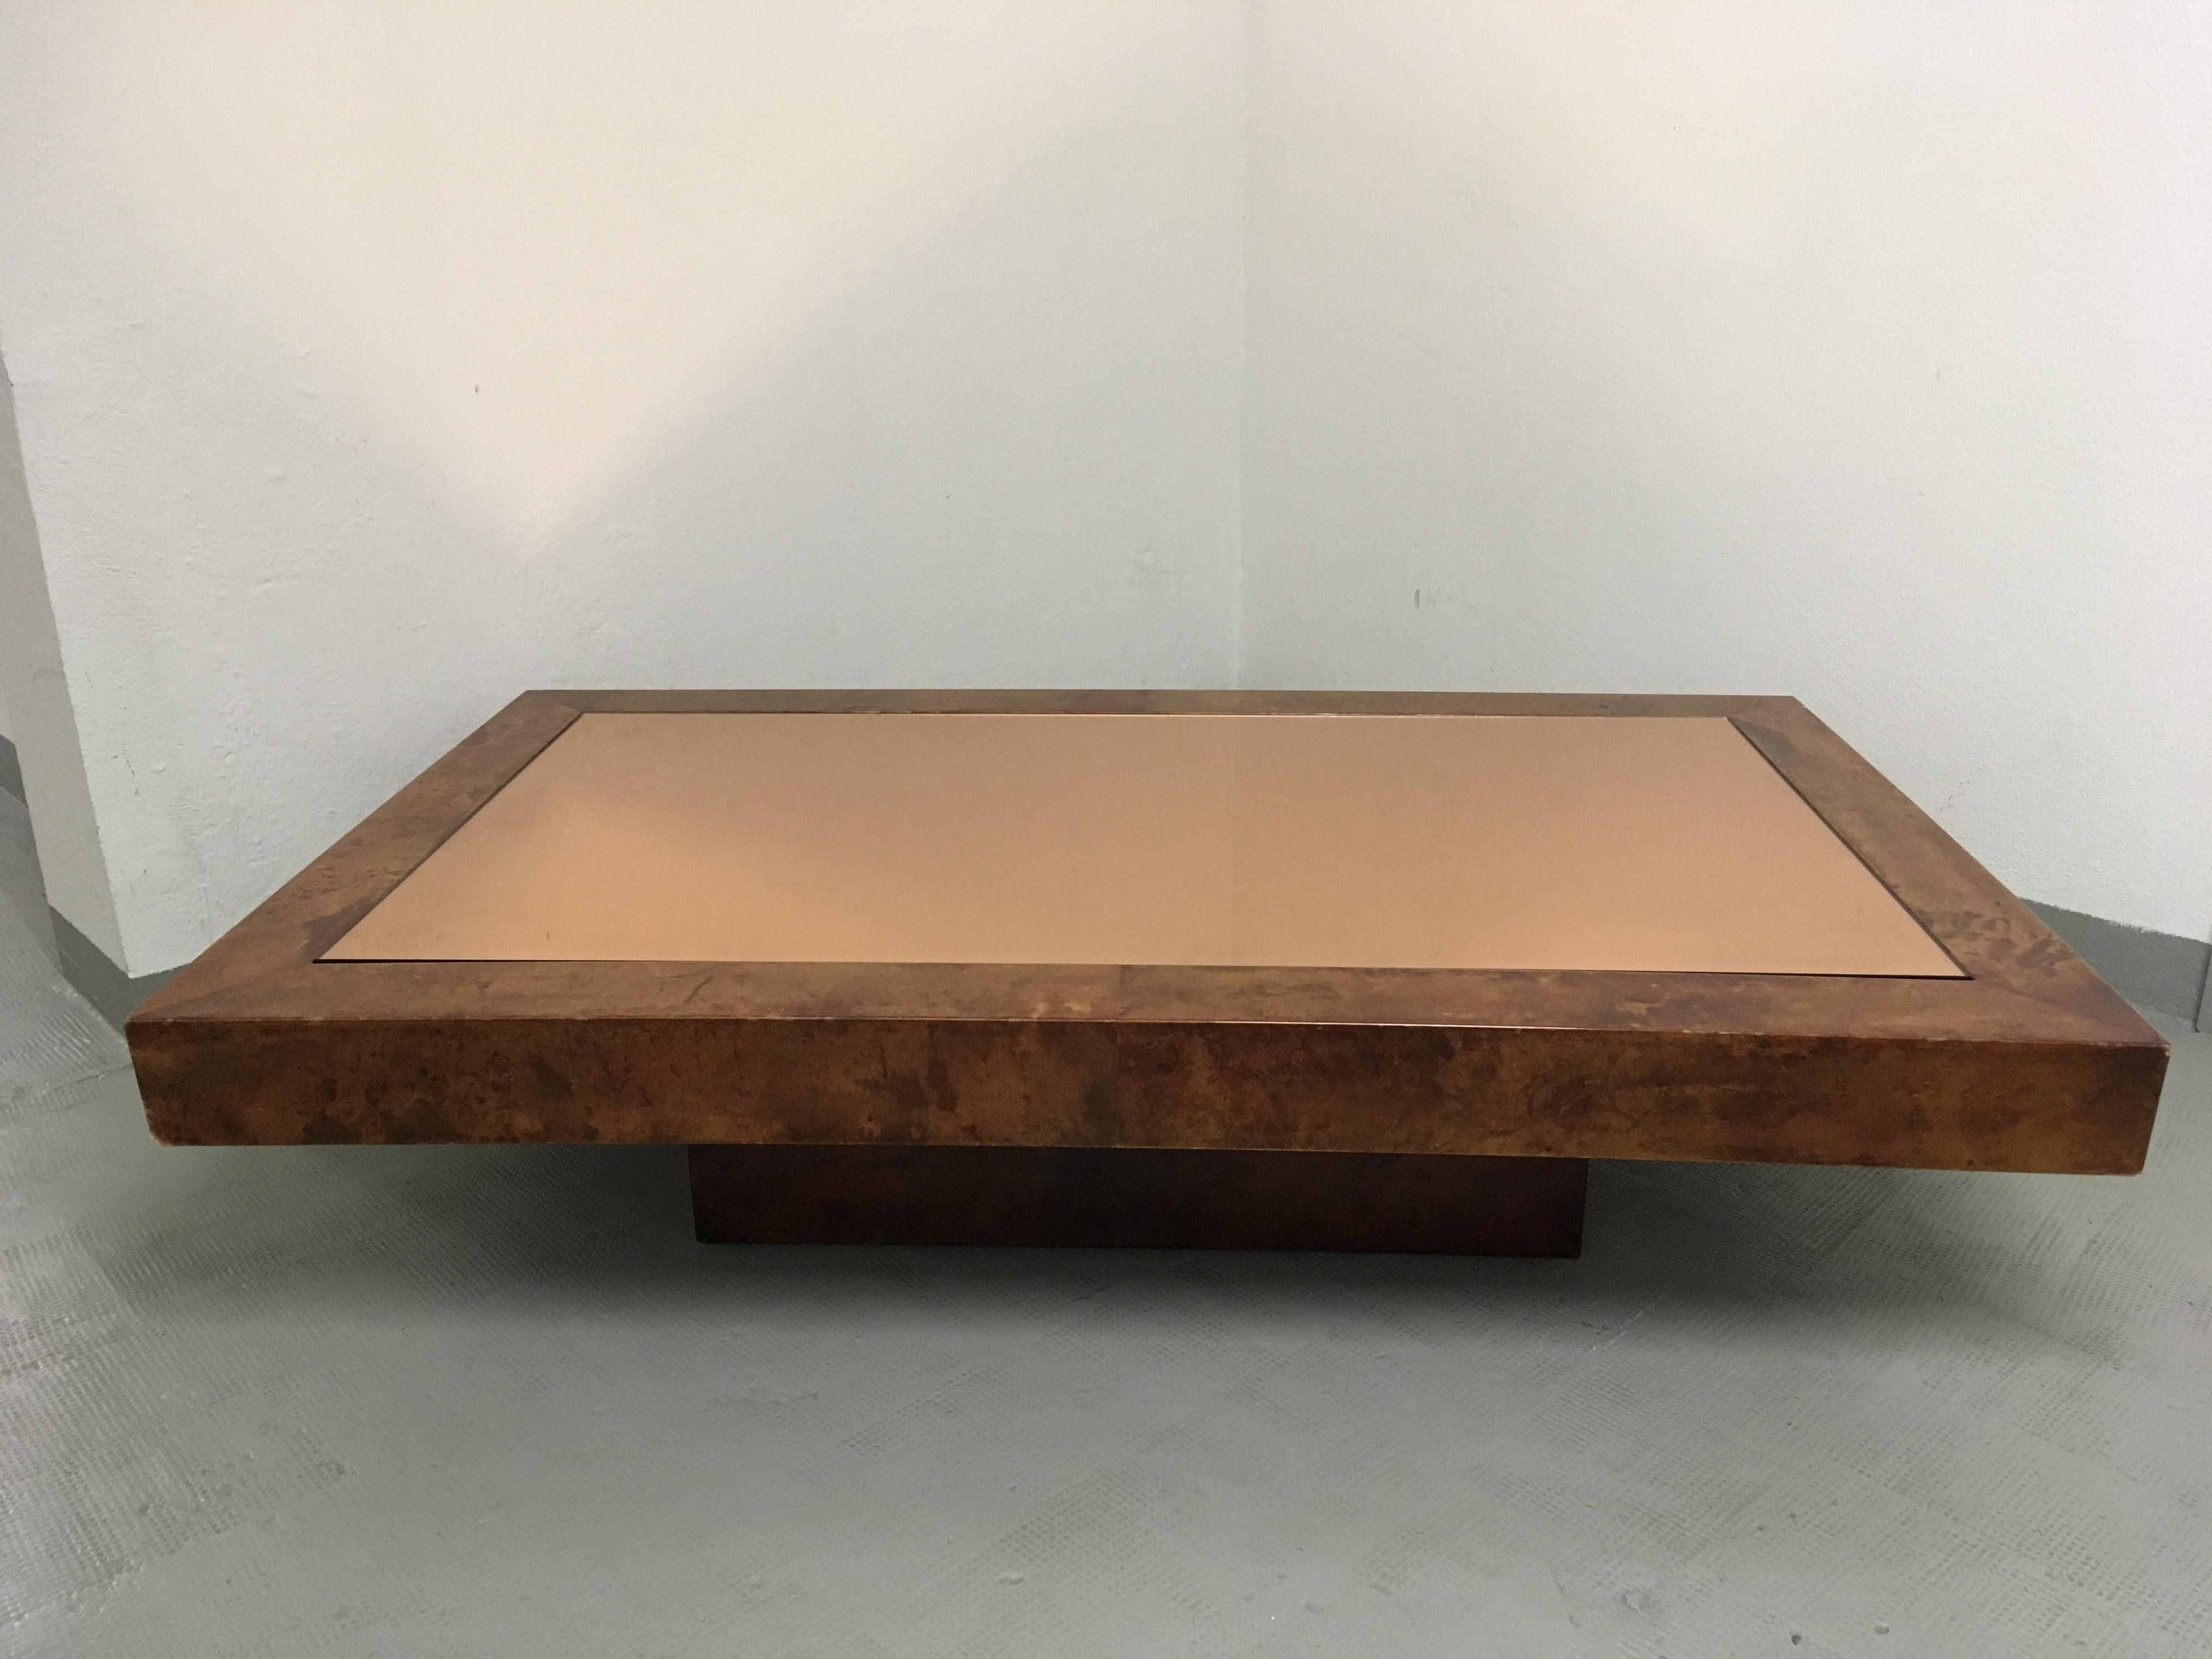 Aldo Tura Table Basse